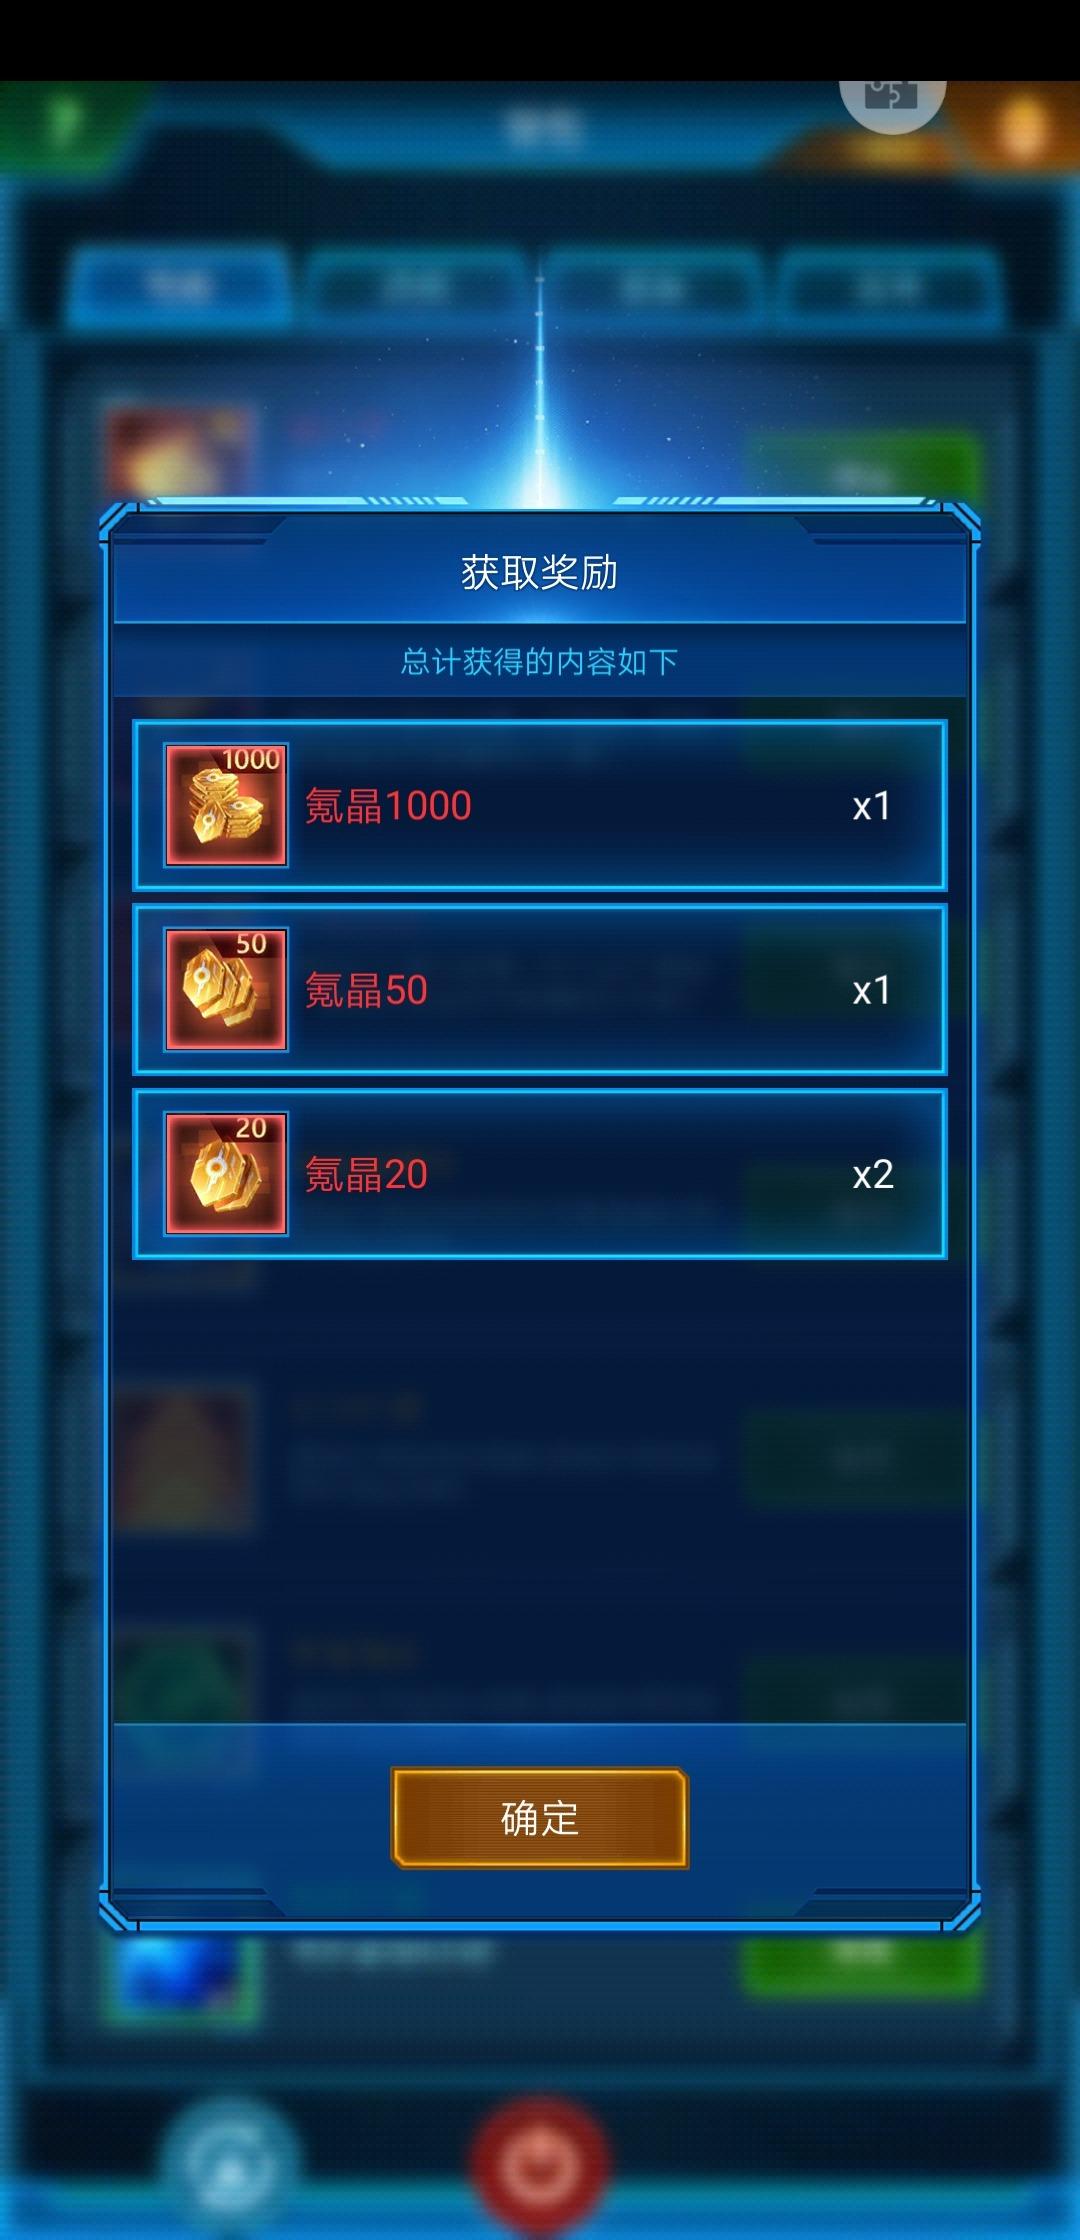 Screenshot_20190812_192727_com.jedigames.p16s.huawei.jpg